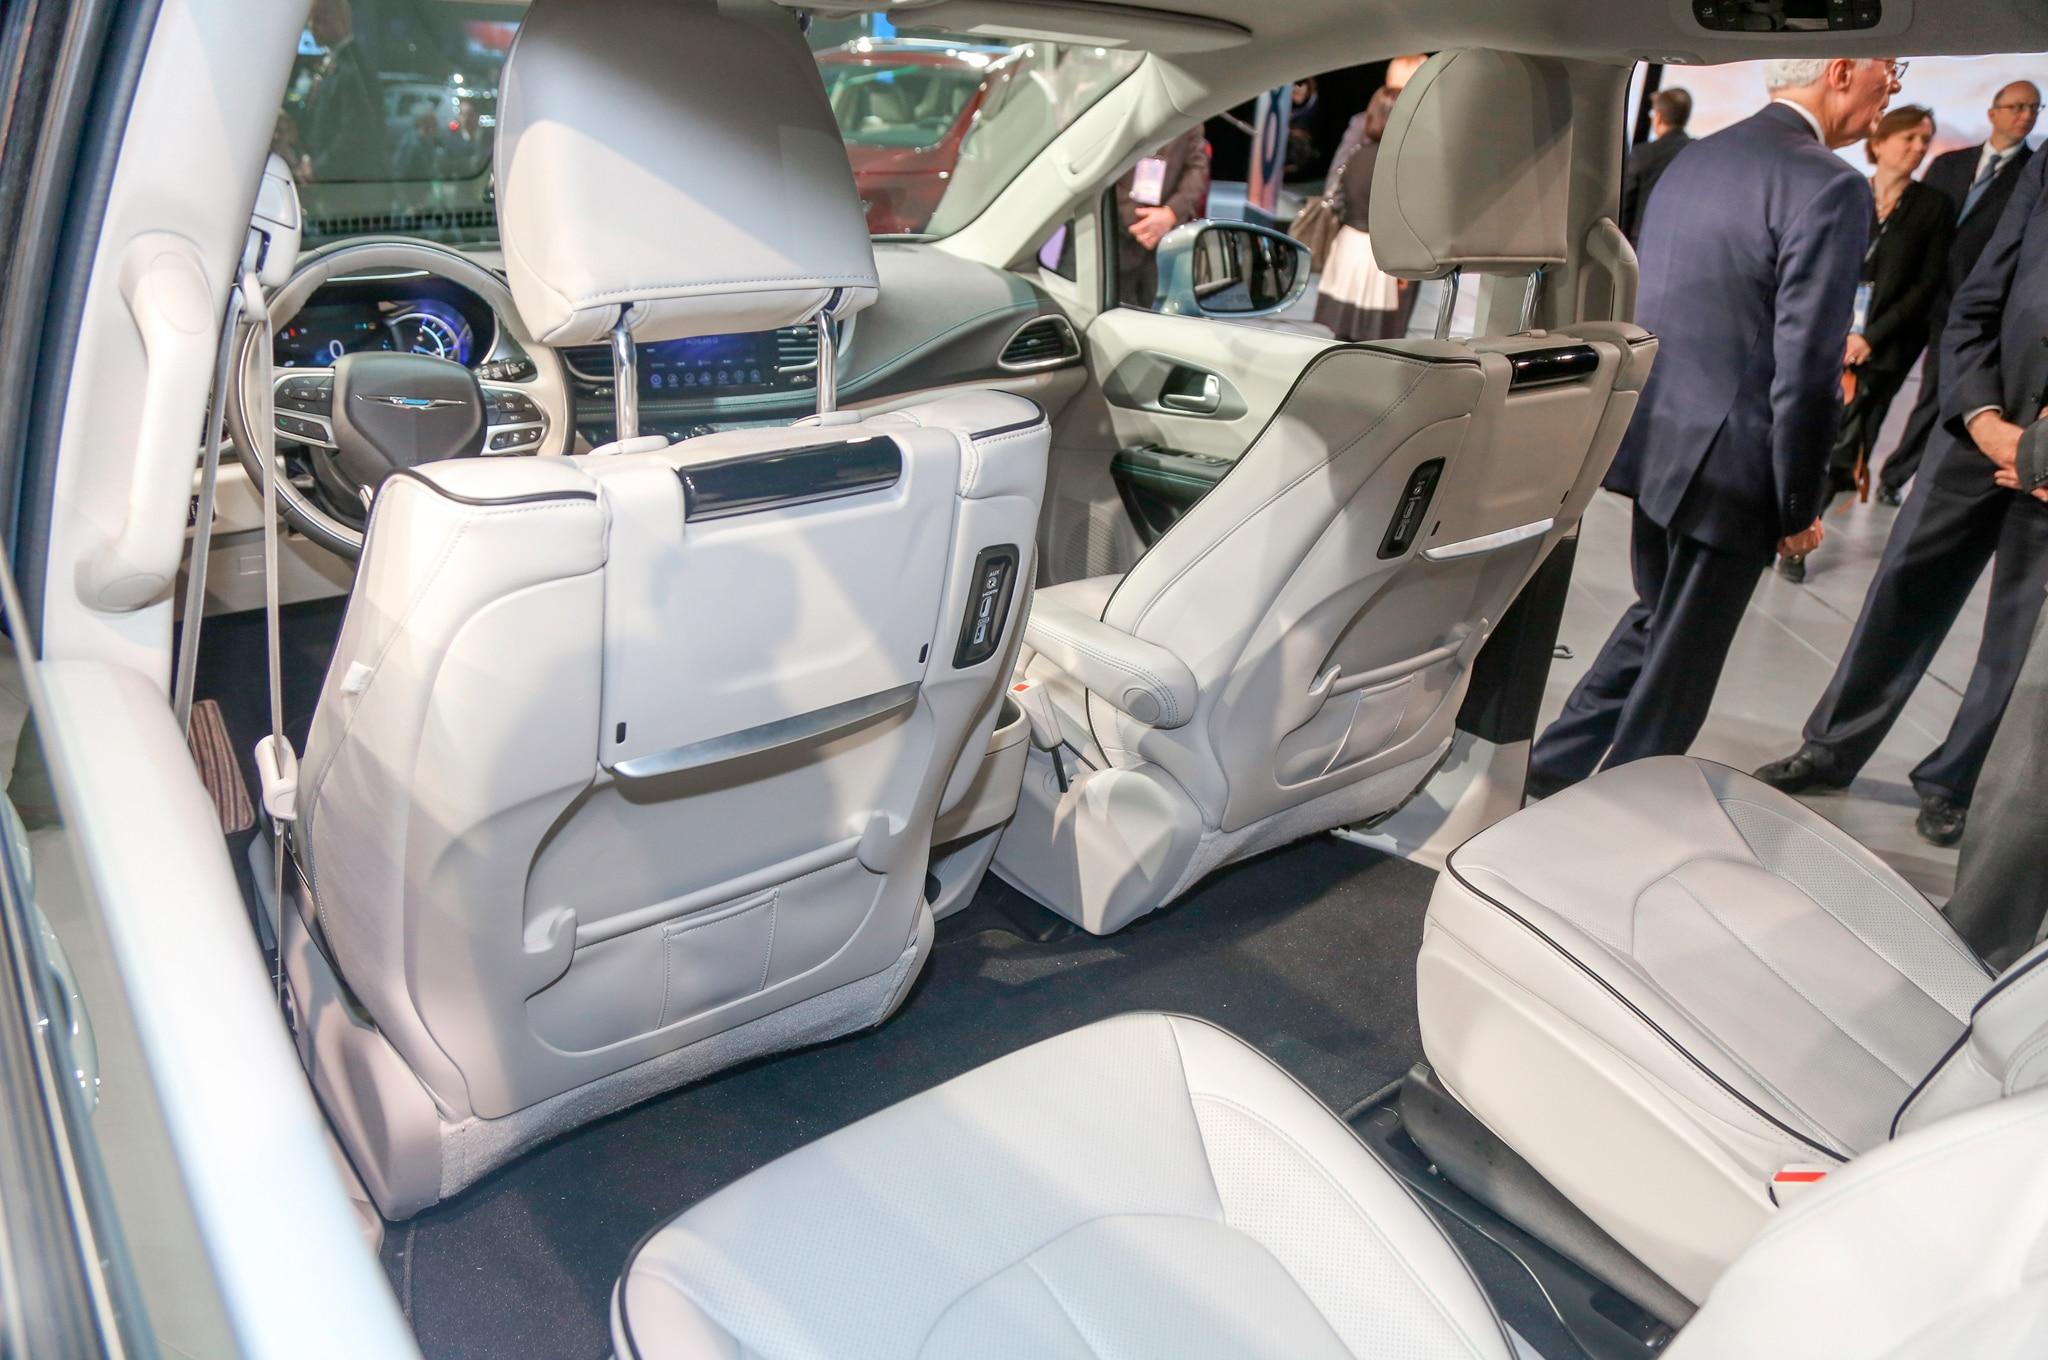 2017 Chrysler Pacifica Hybrid Rear Interior Seats 29 Junio 2016 Wpengine